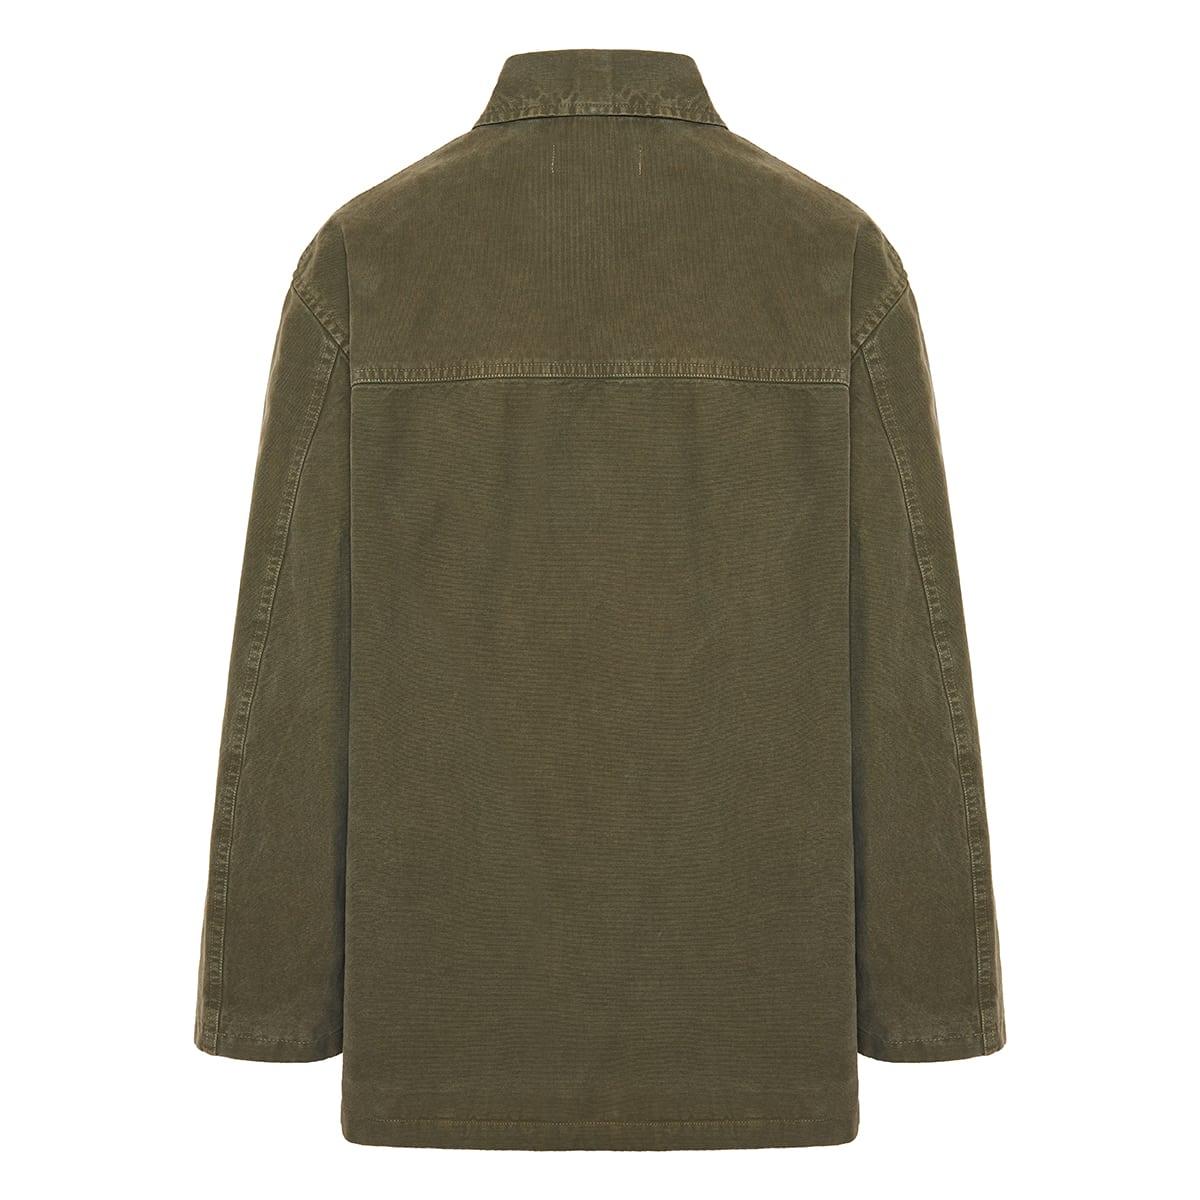 Connor cotton jacket